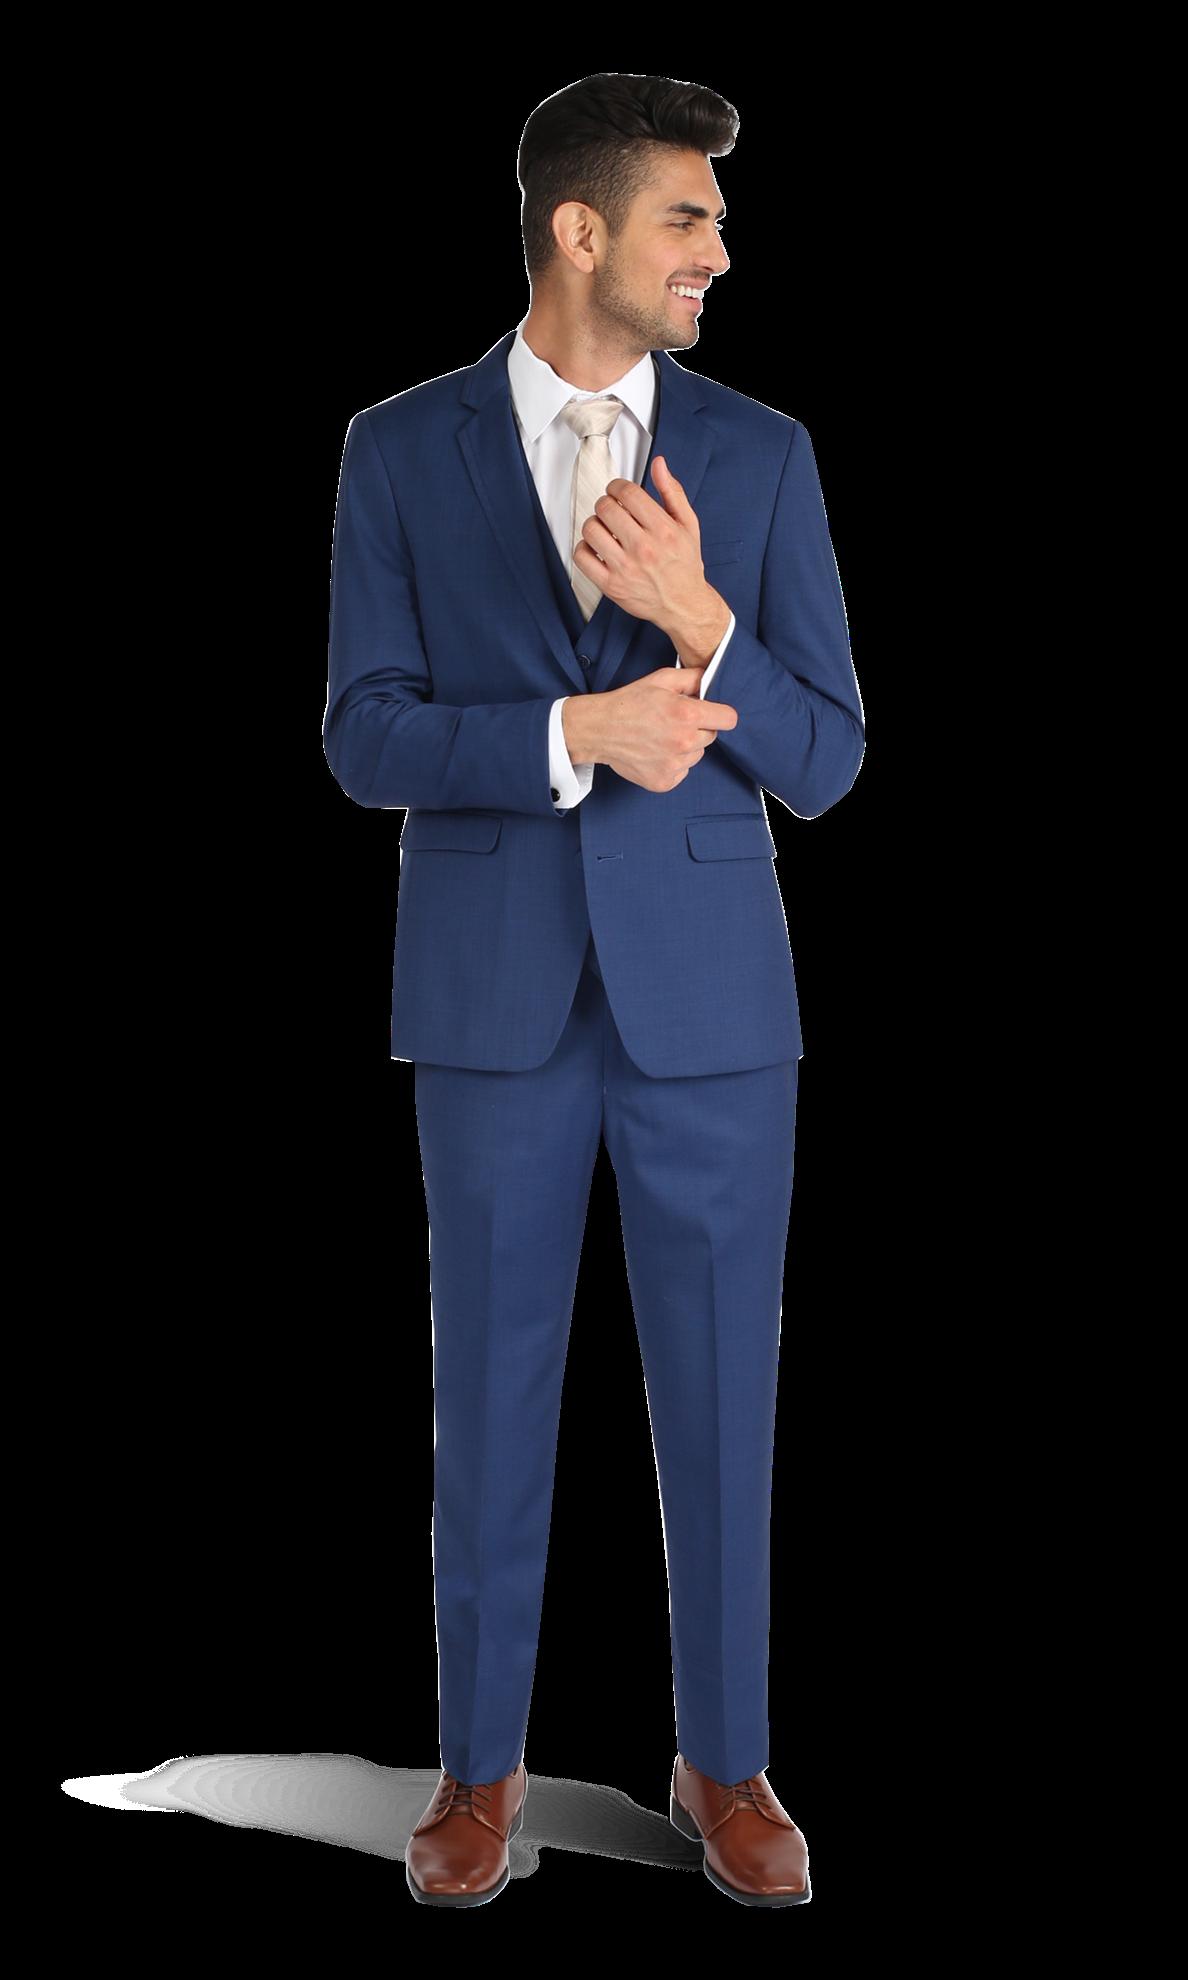 Transparent Suit PNG, Suit HD Pictures Free Download.